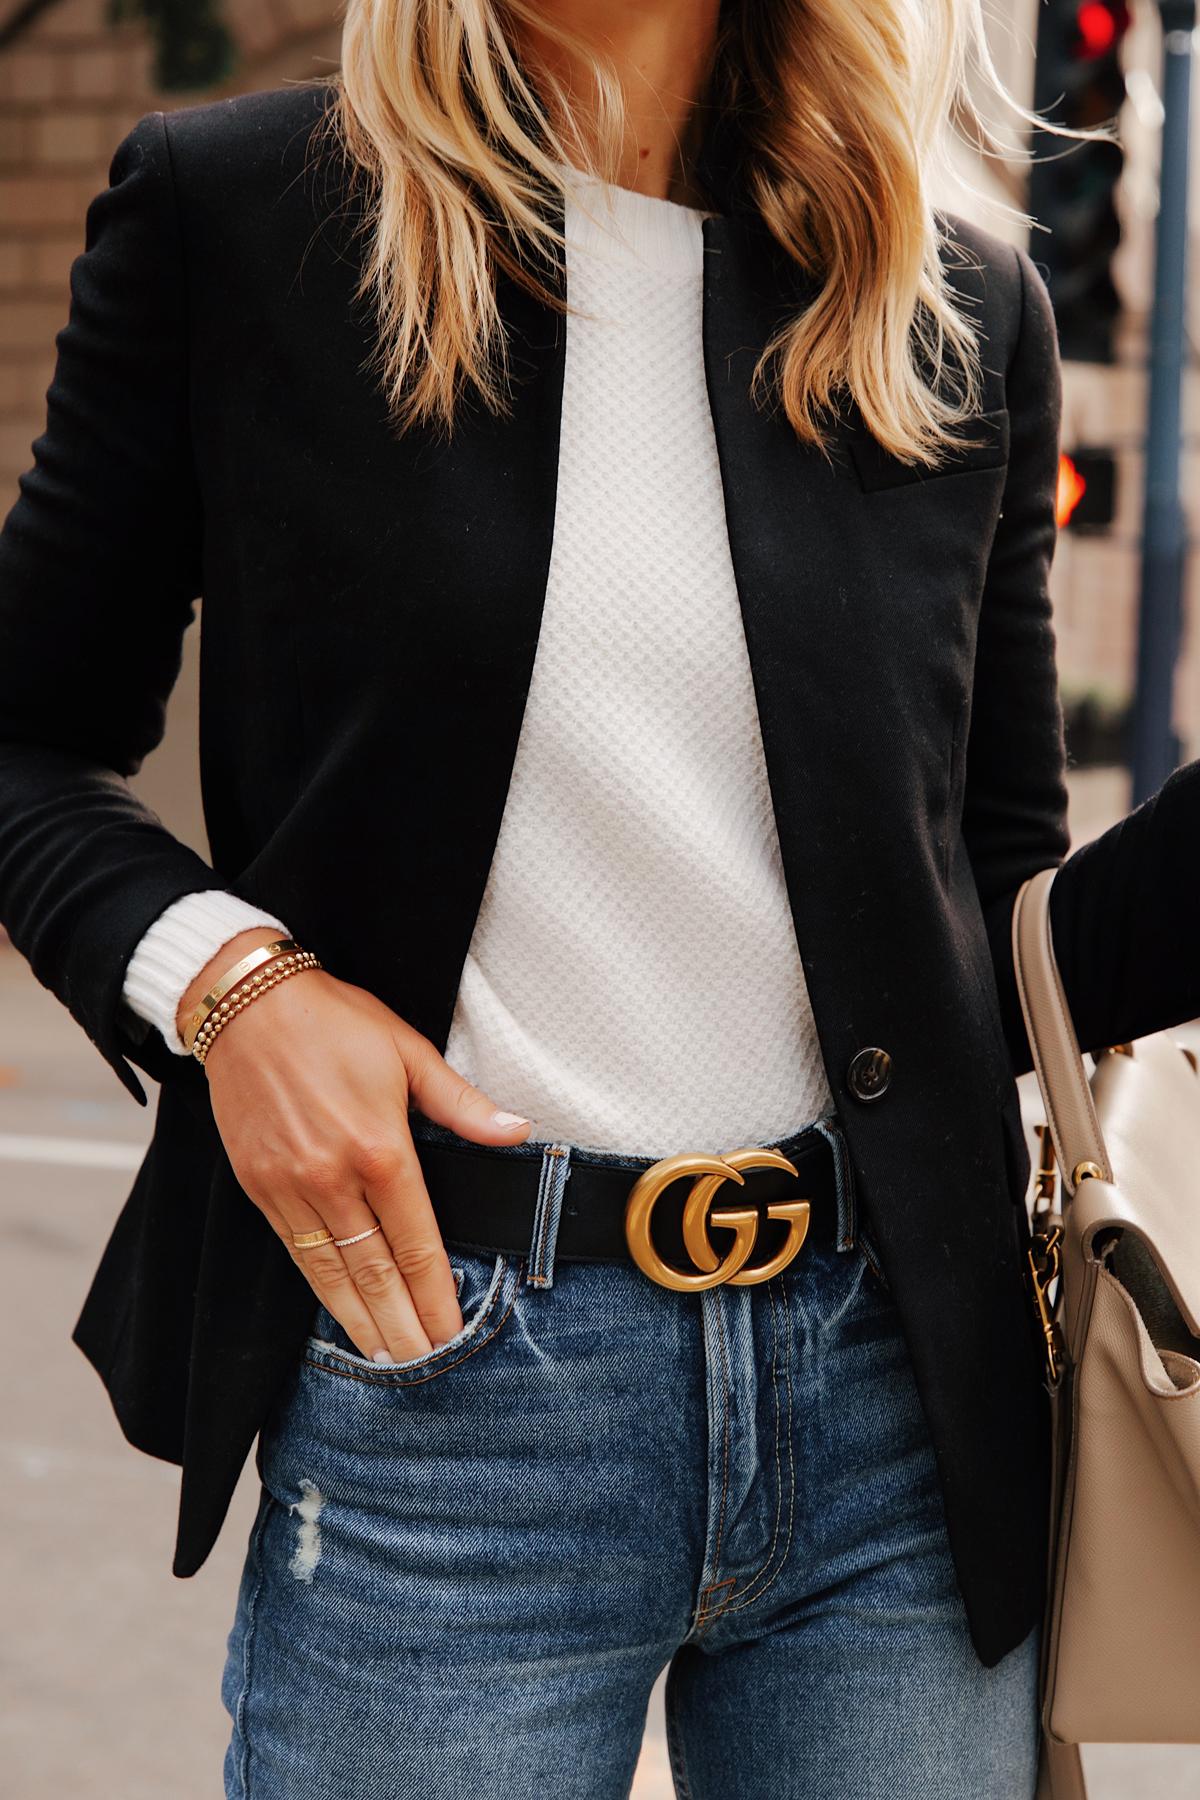 Fashion Jackson Wearing JCrew Black Blazer White Sweater Gucci Belt